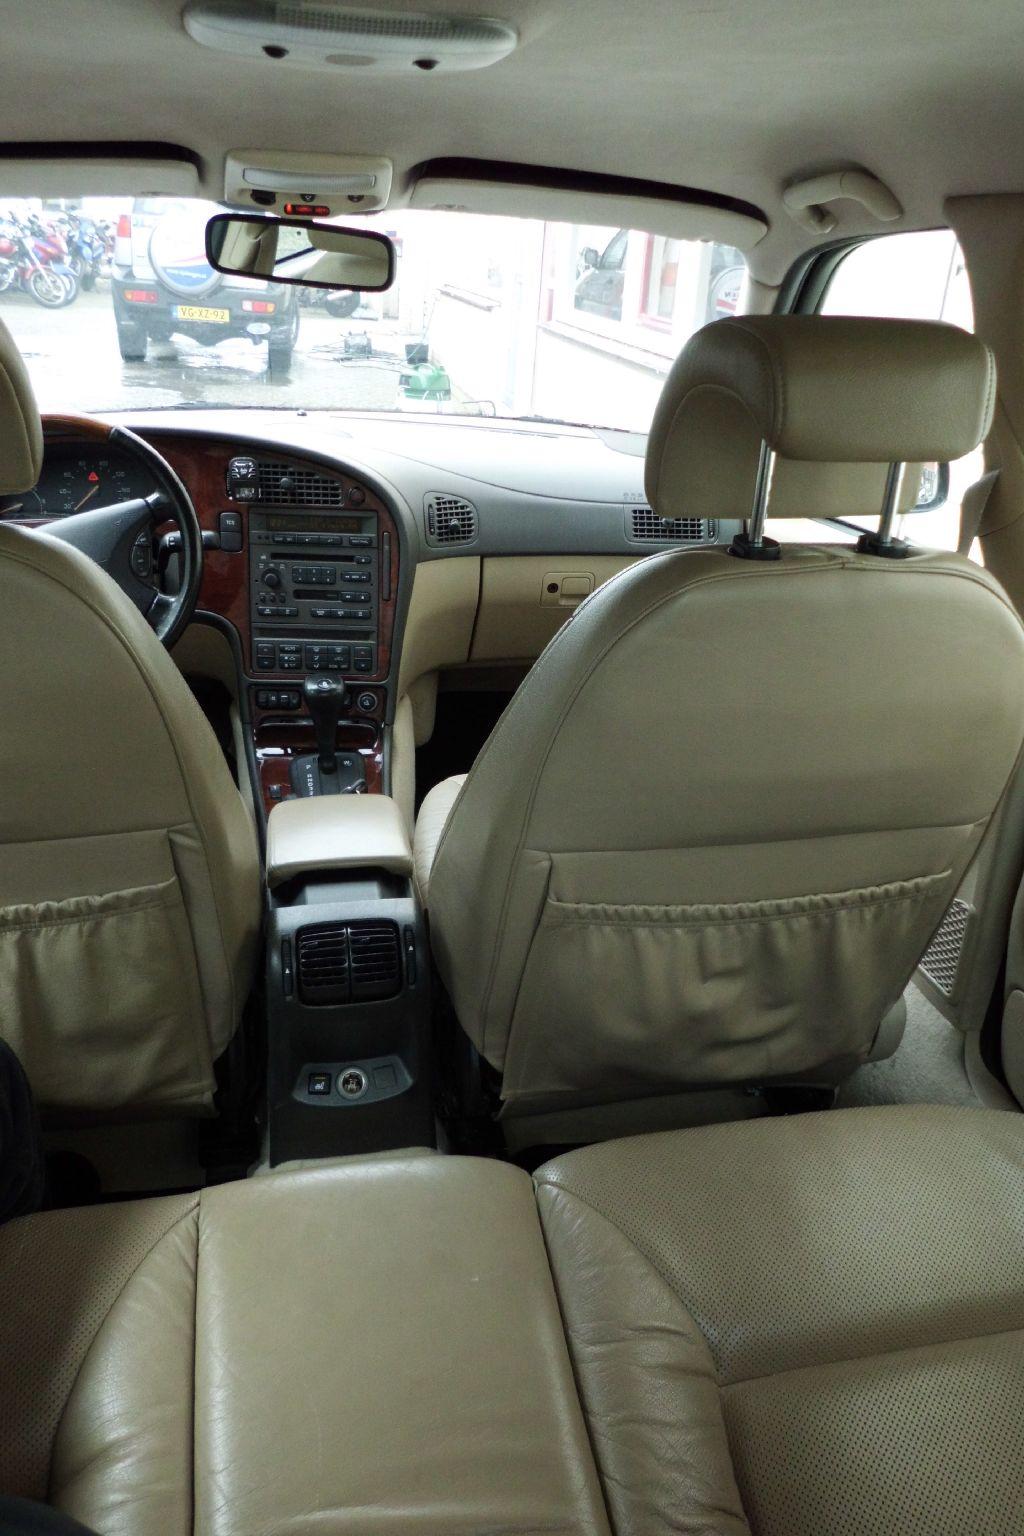 Saab 9000 interieur – De Autobekleder